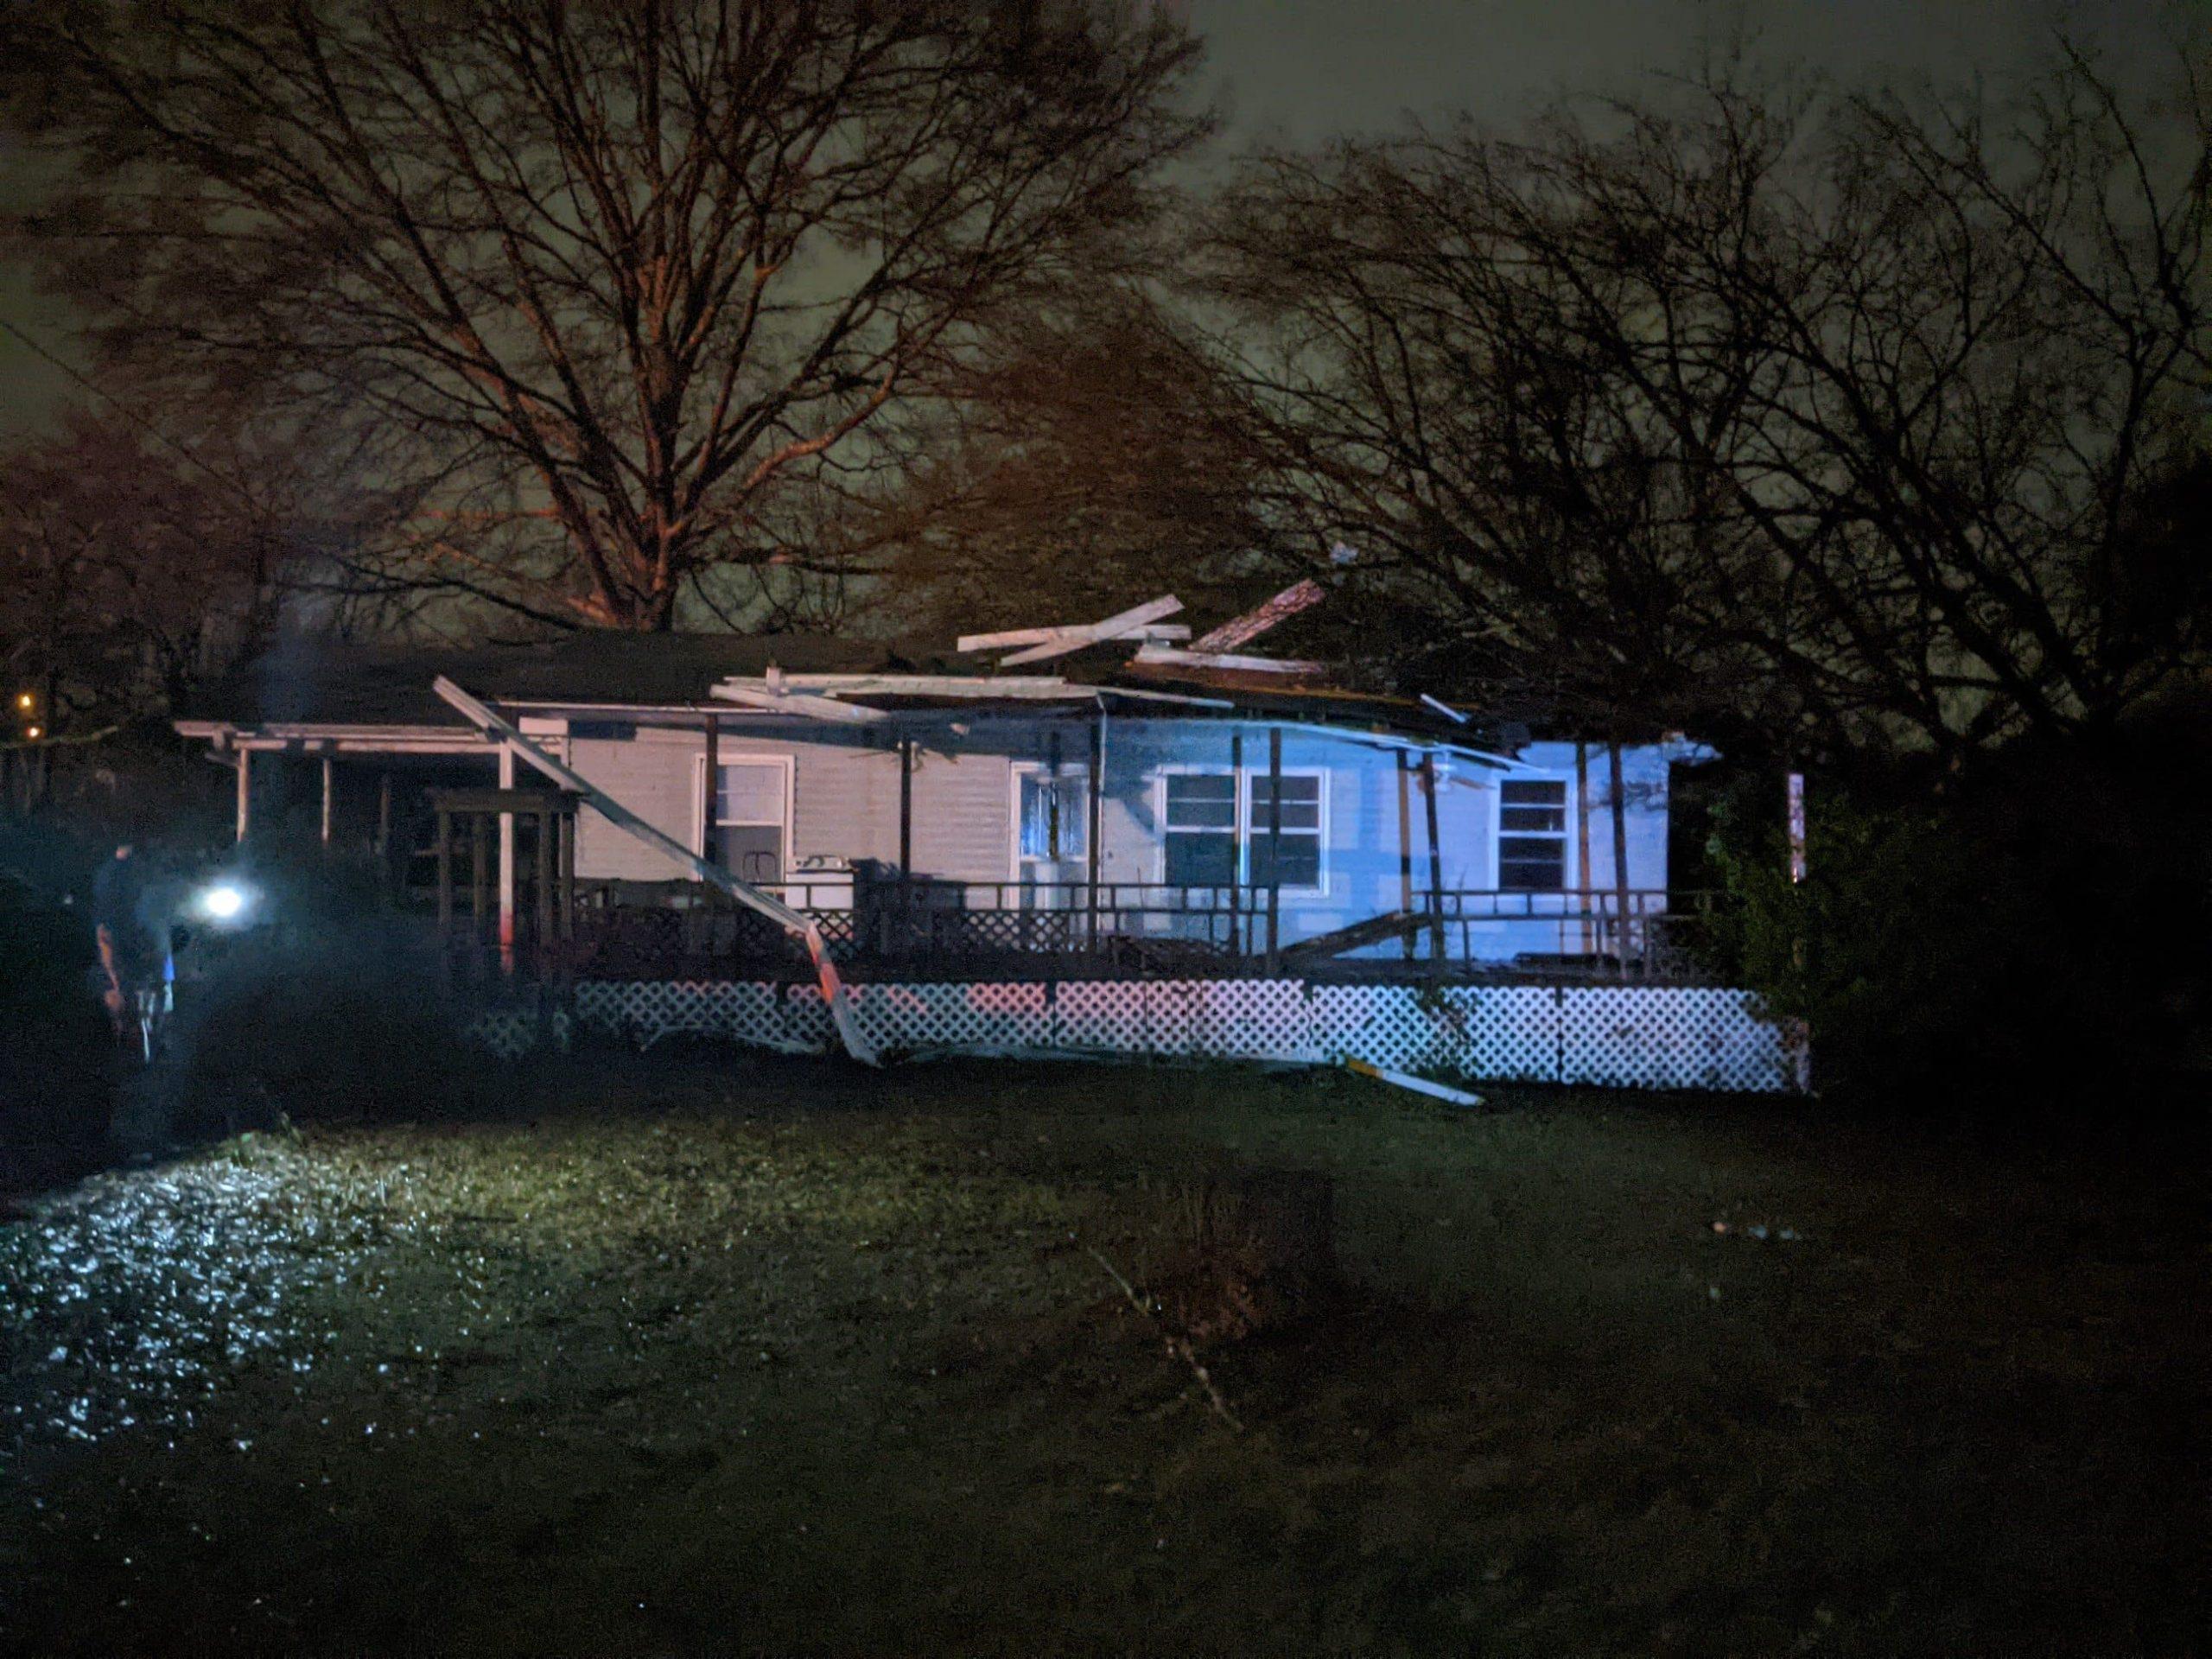 1 dead, around 30 injured after apparent tornado in Jefferson County